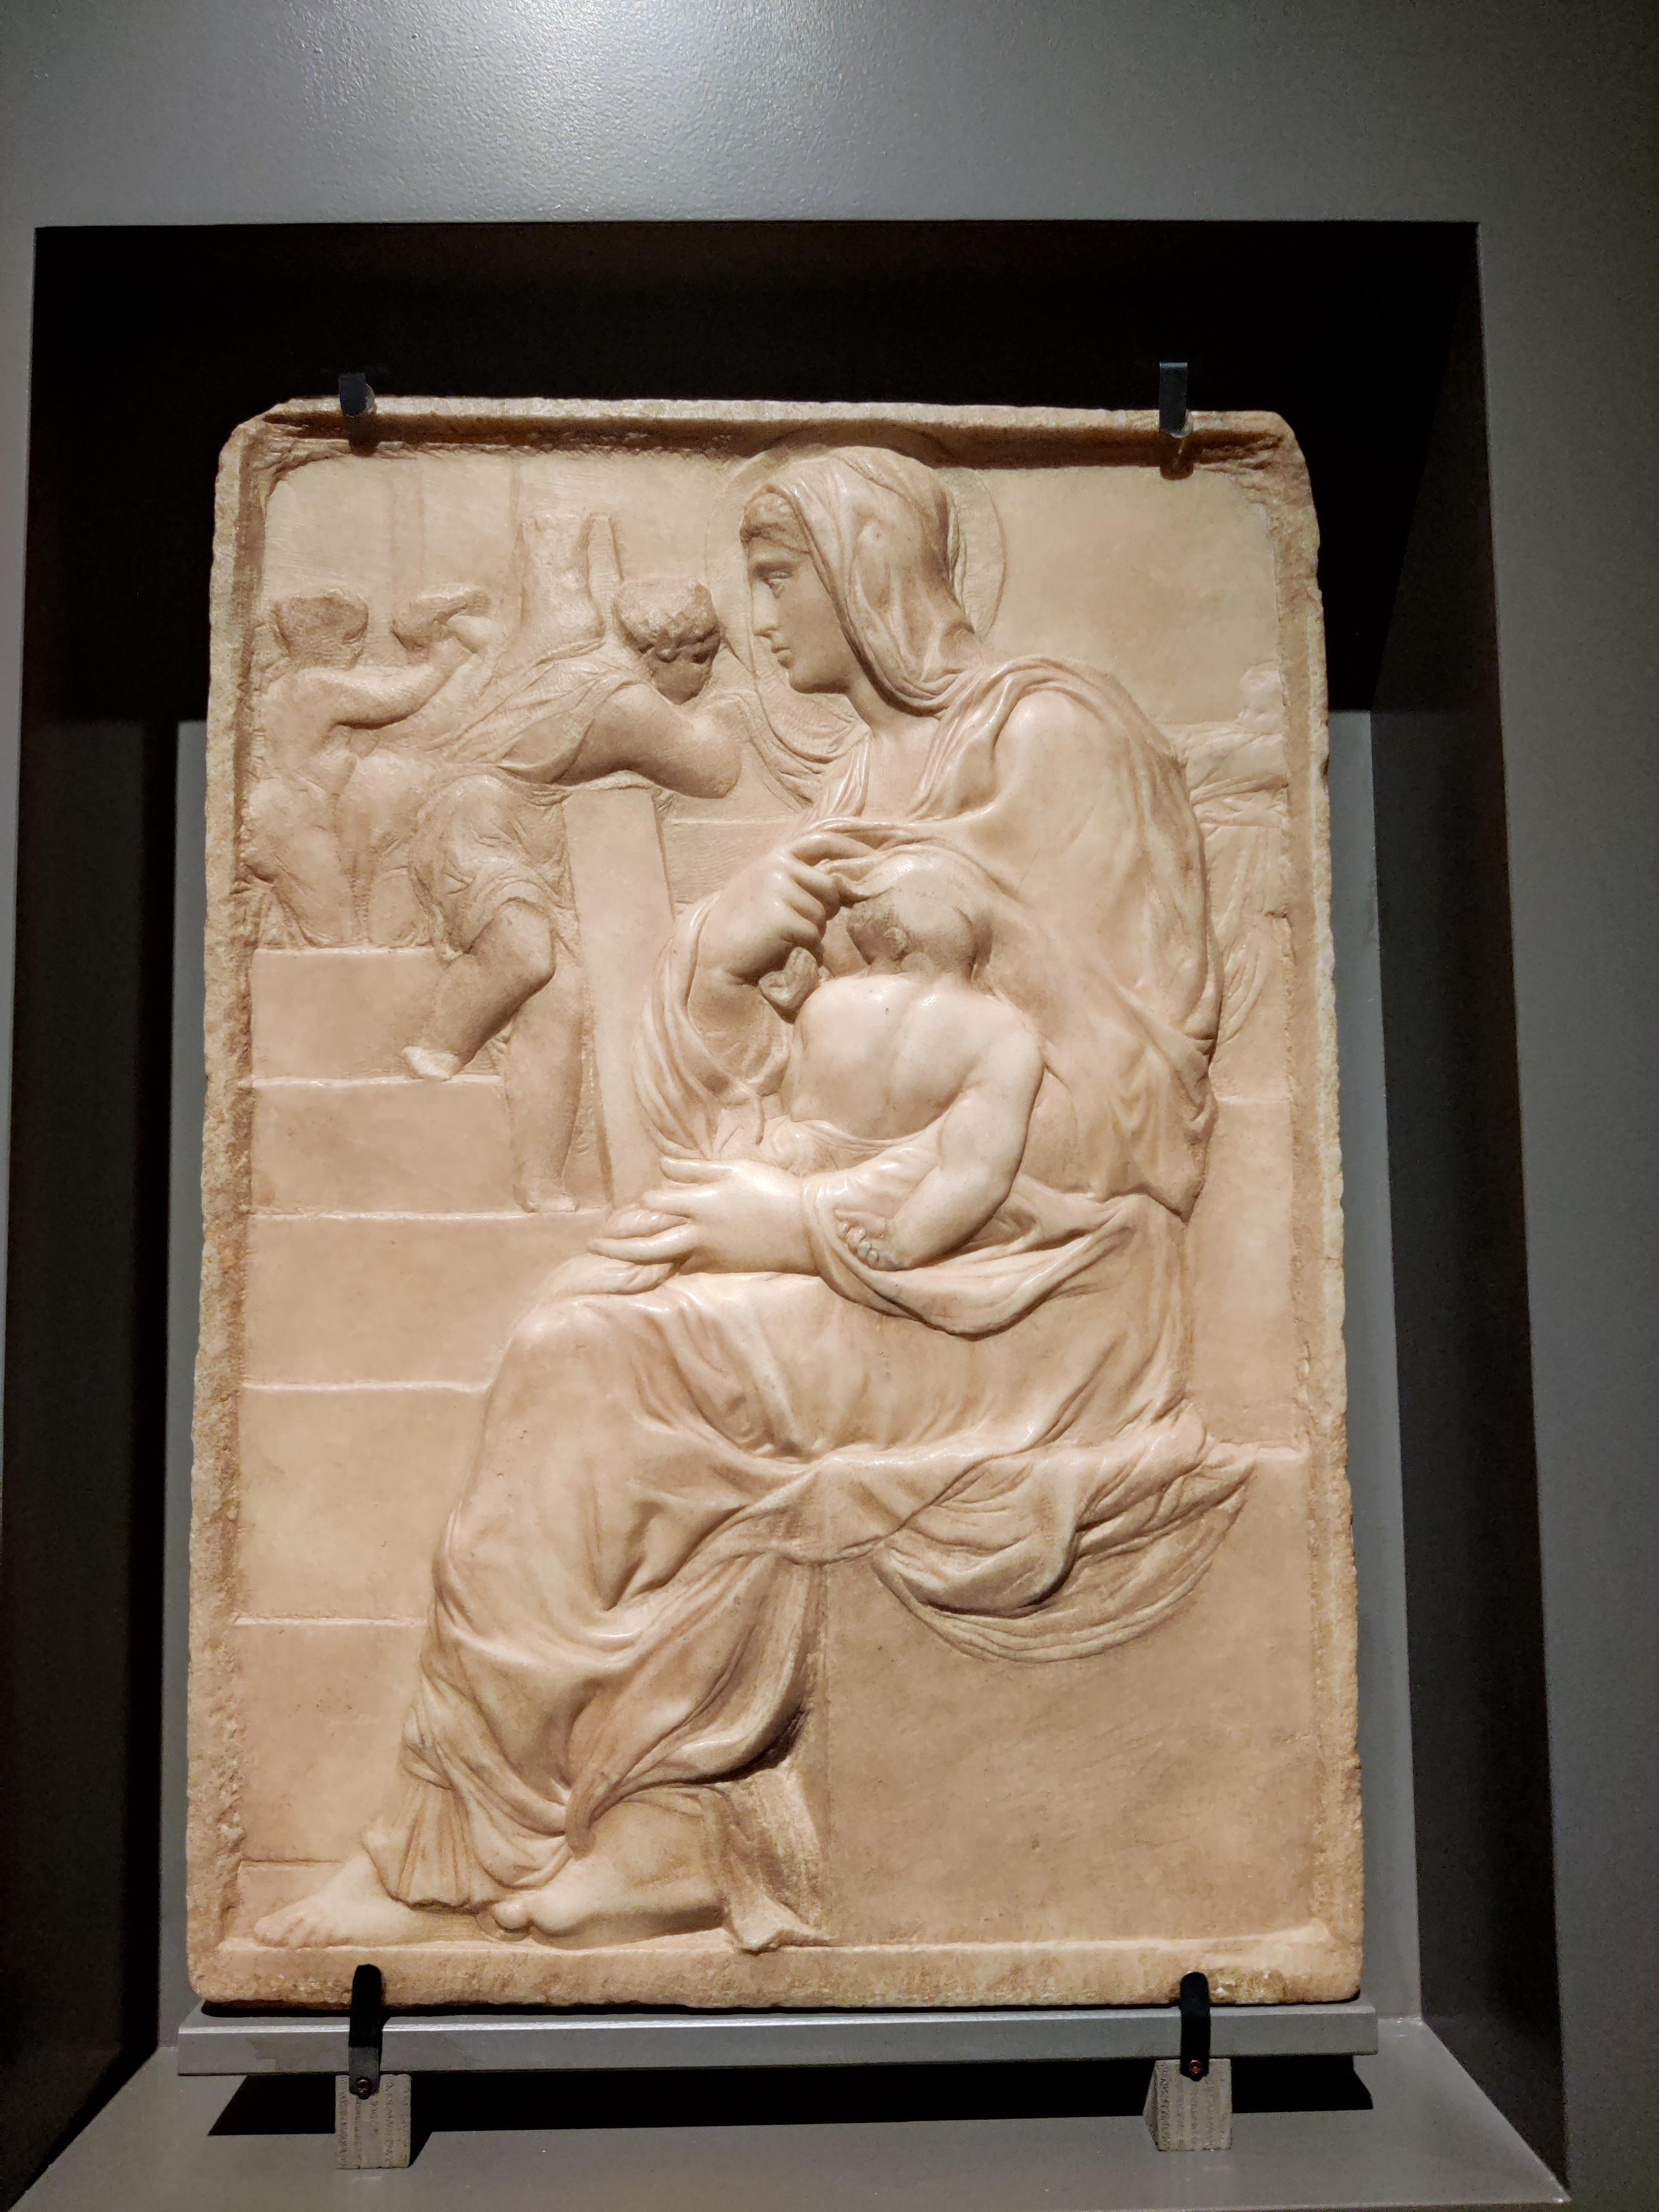 Мадонна Делла скала,1490.Микеланджело 15 лет.